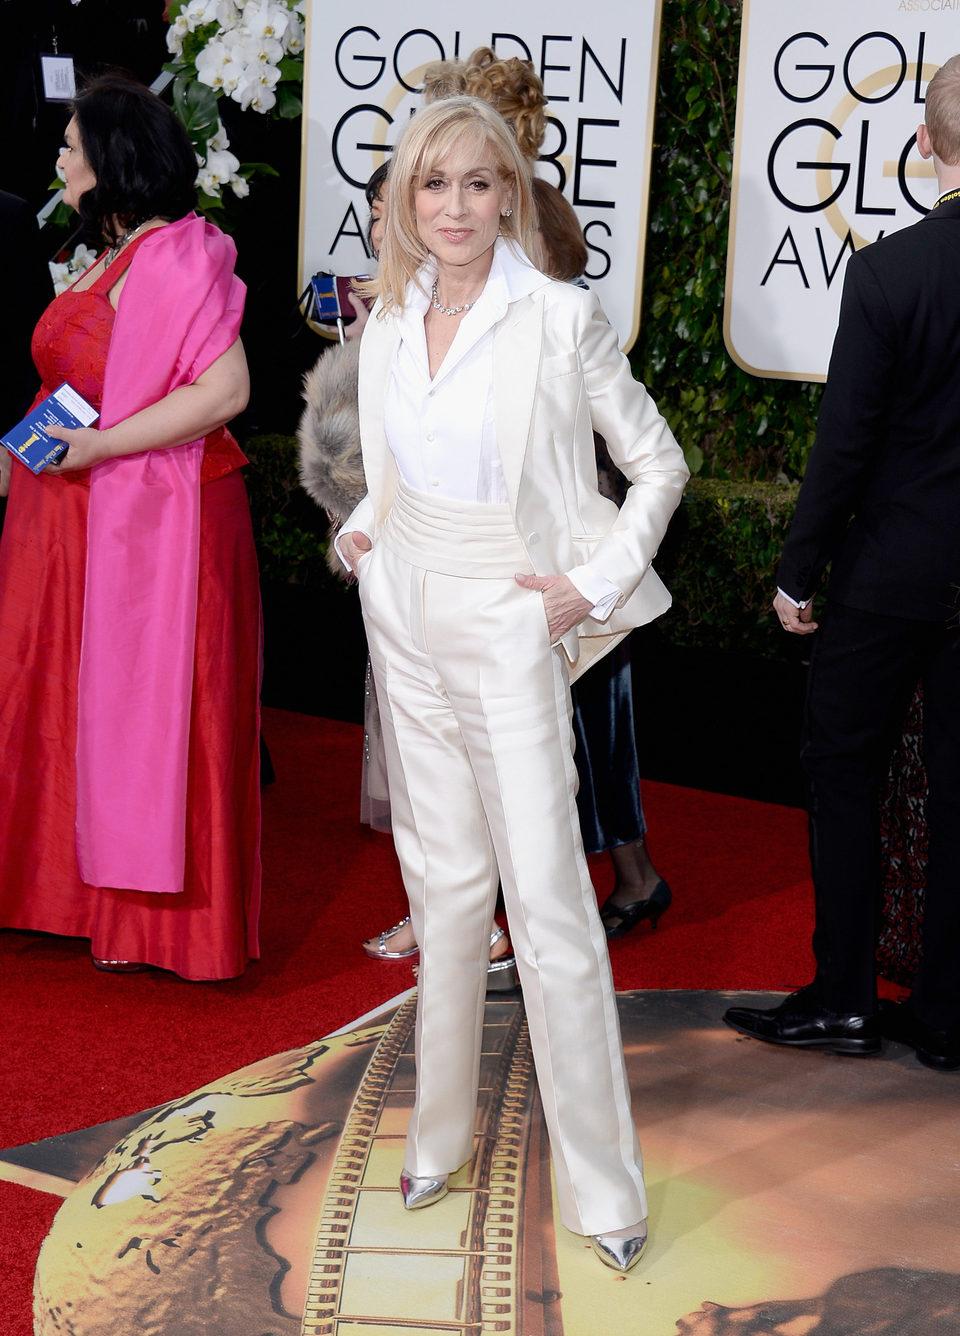 Judith Light in the 2016 Golden Globes red carpet